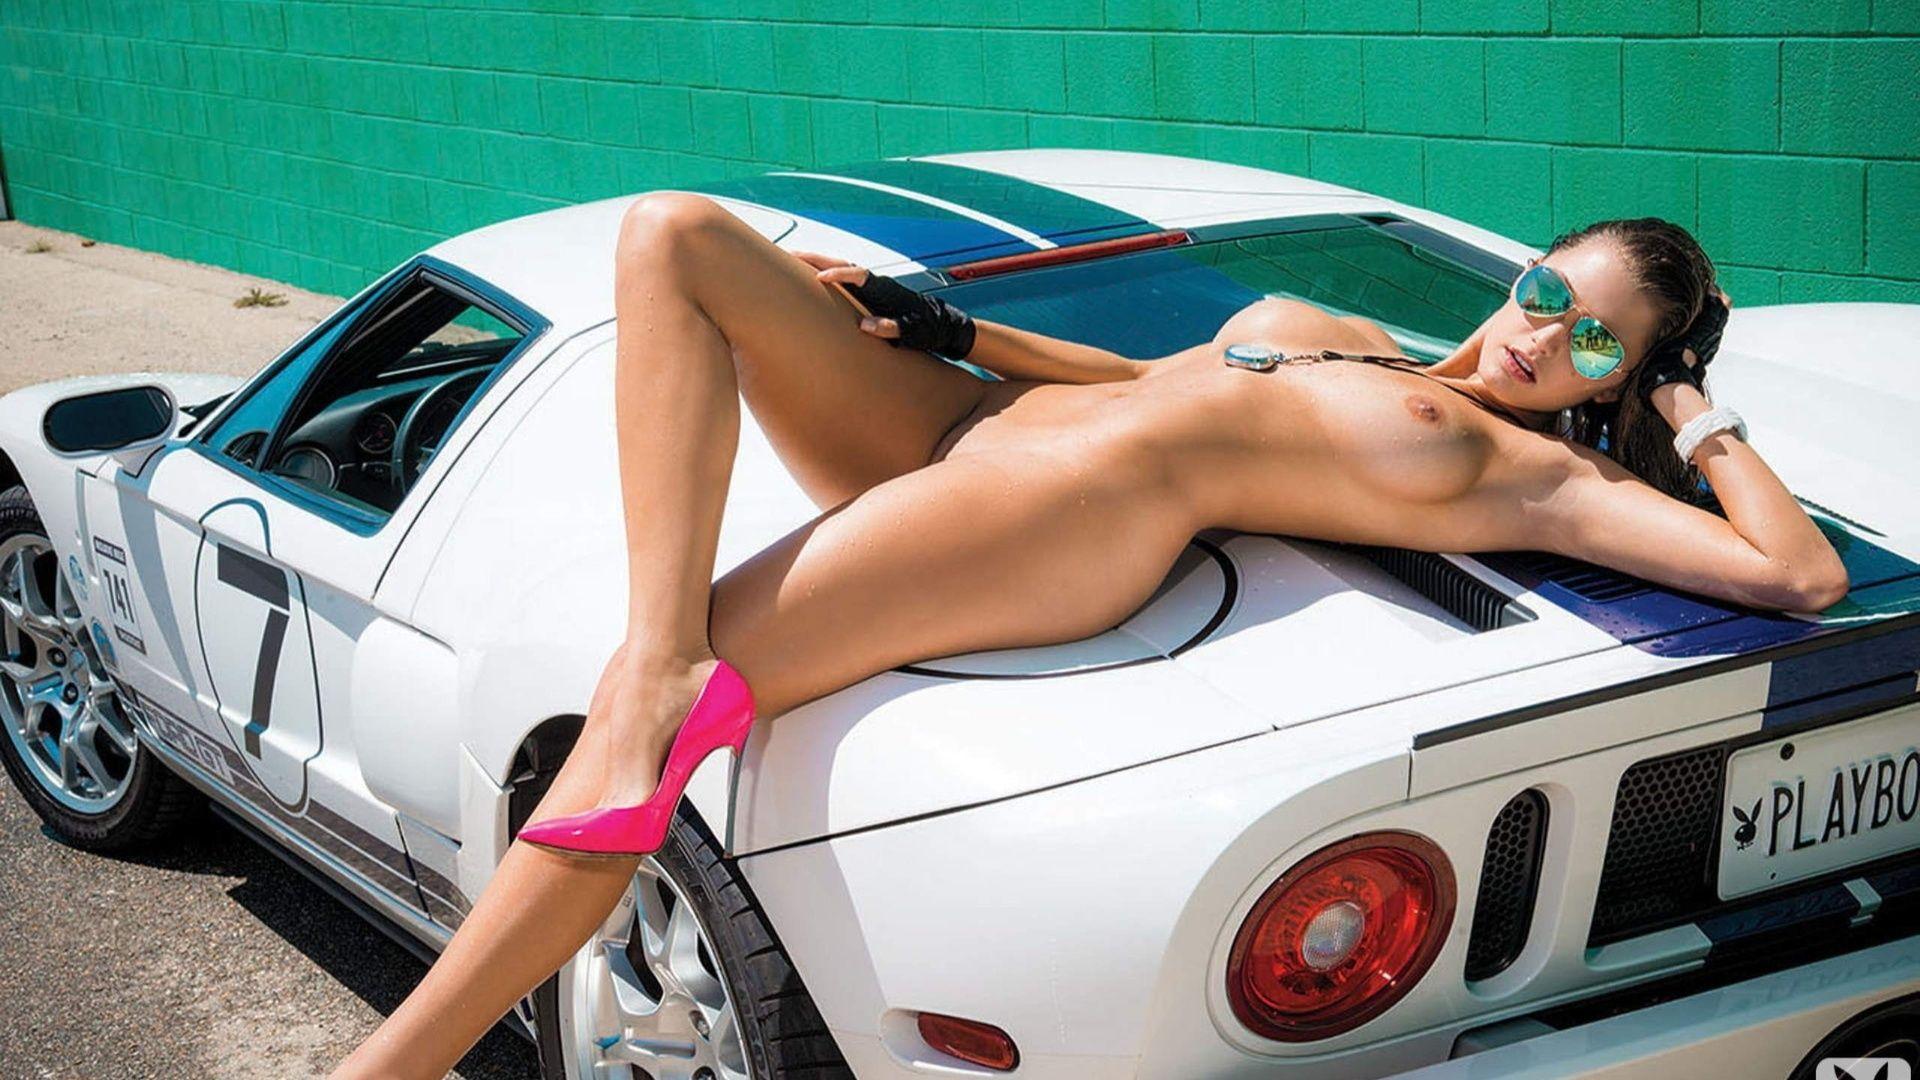 Nude On Car 63